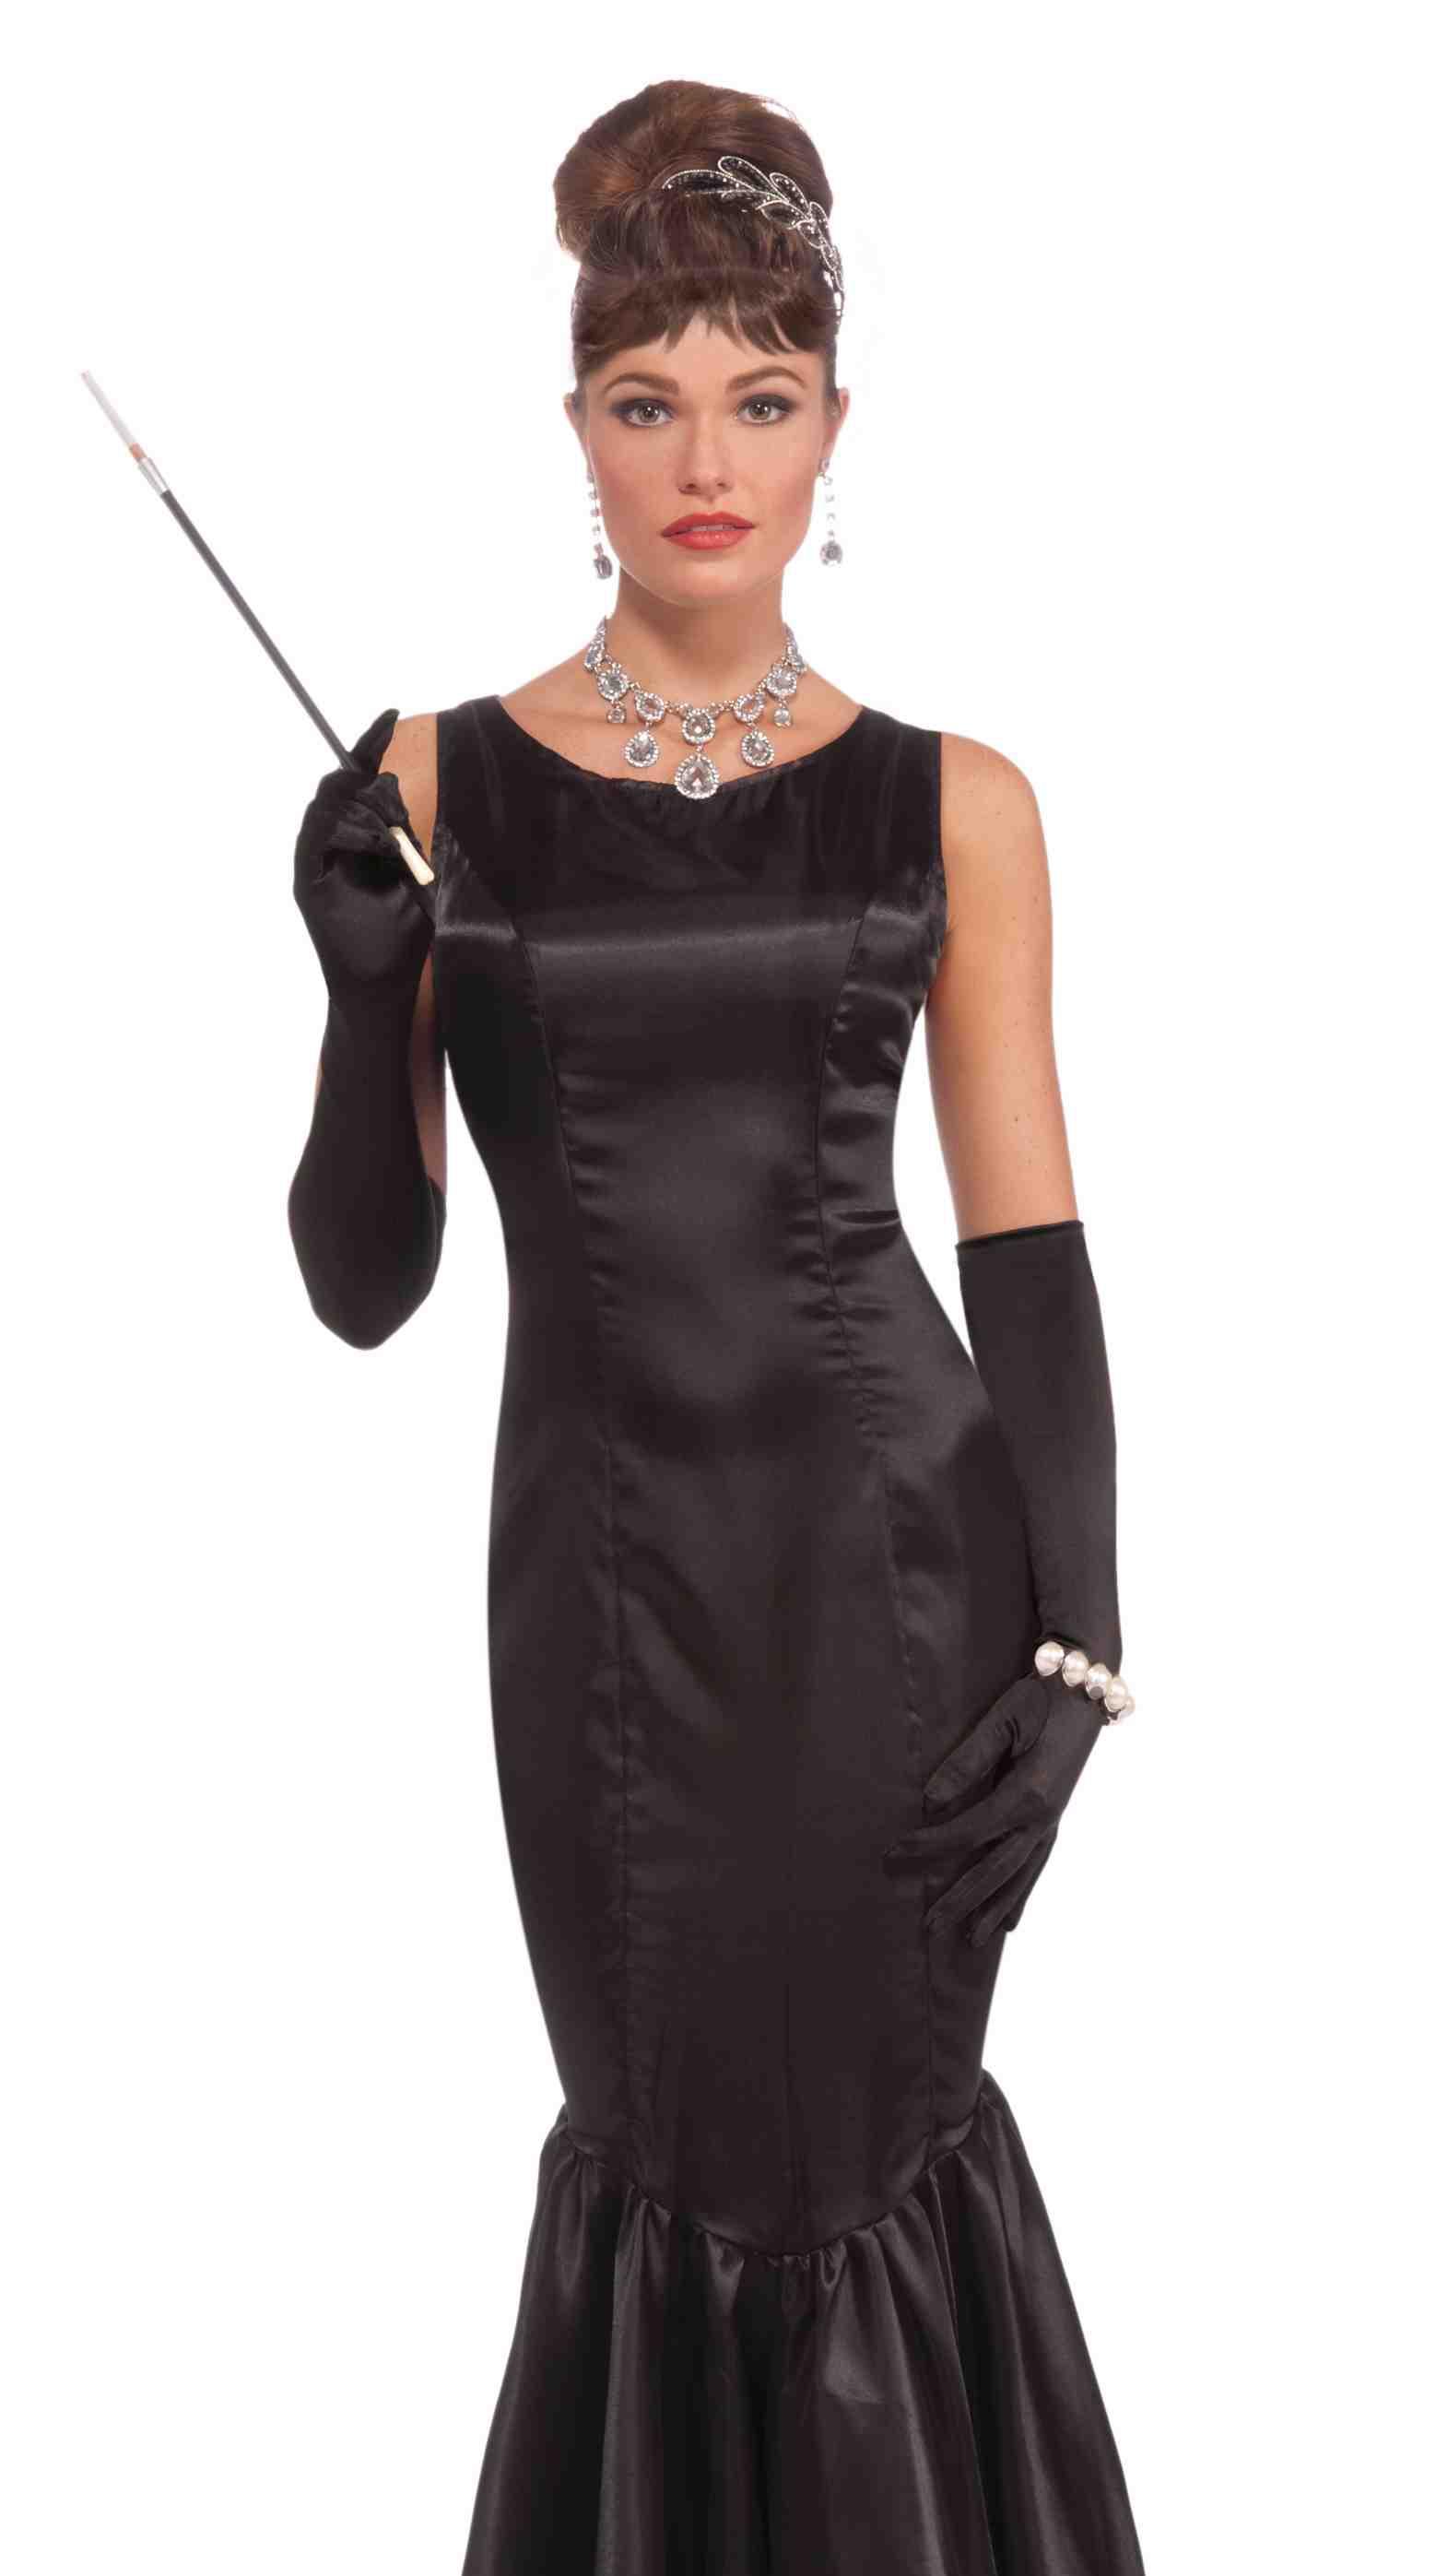 retro film star audrey hepburn halloween fancy dress. Black Bedroom Furniture Sets. Home Design Ideas